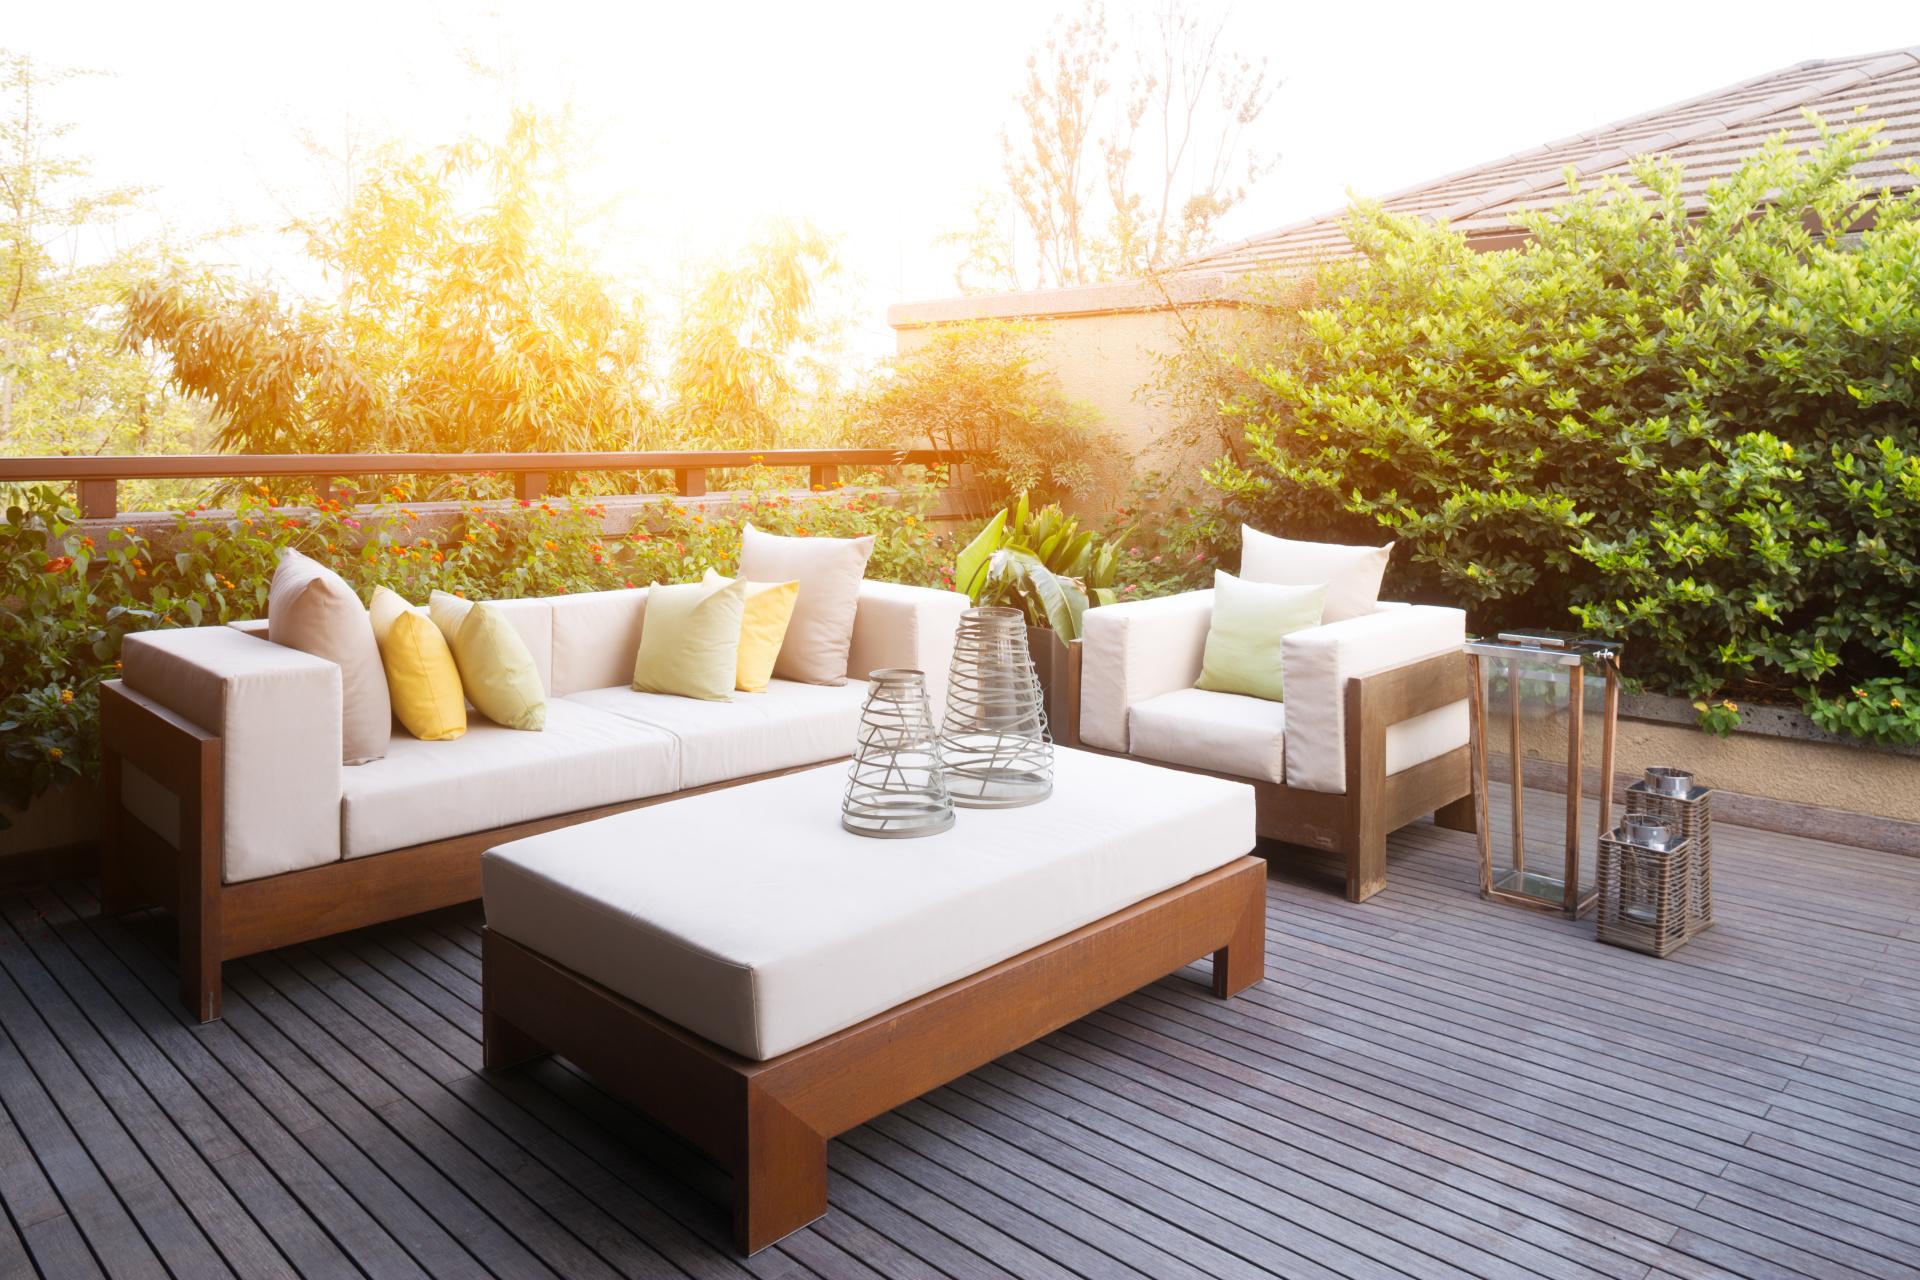 Outdoor Living, Outdoor Patio Furniture